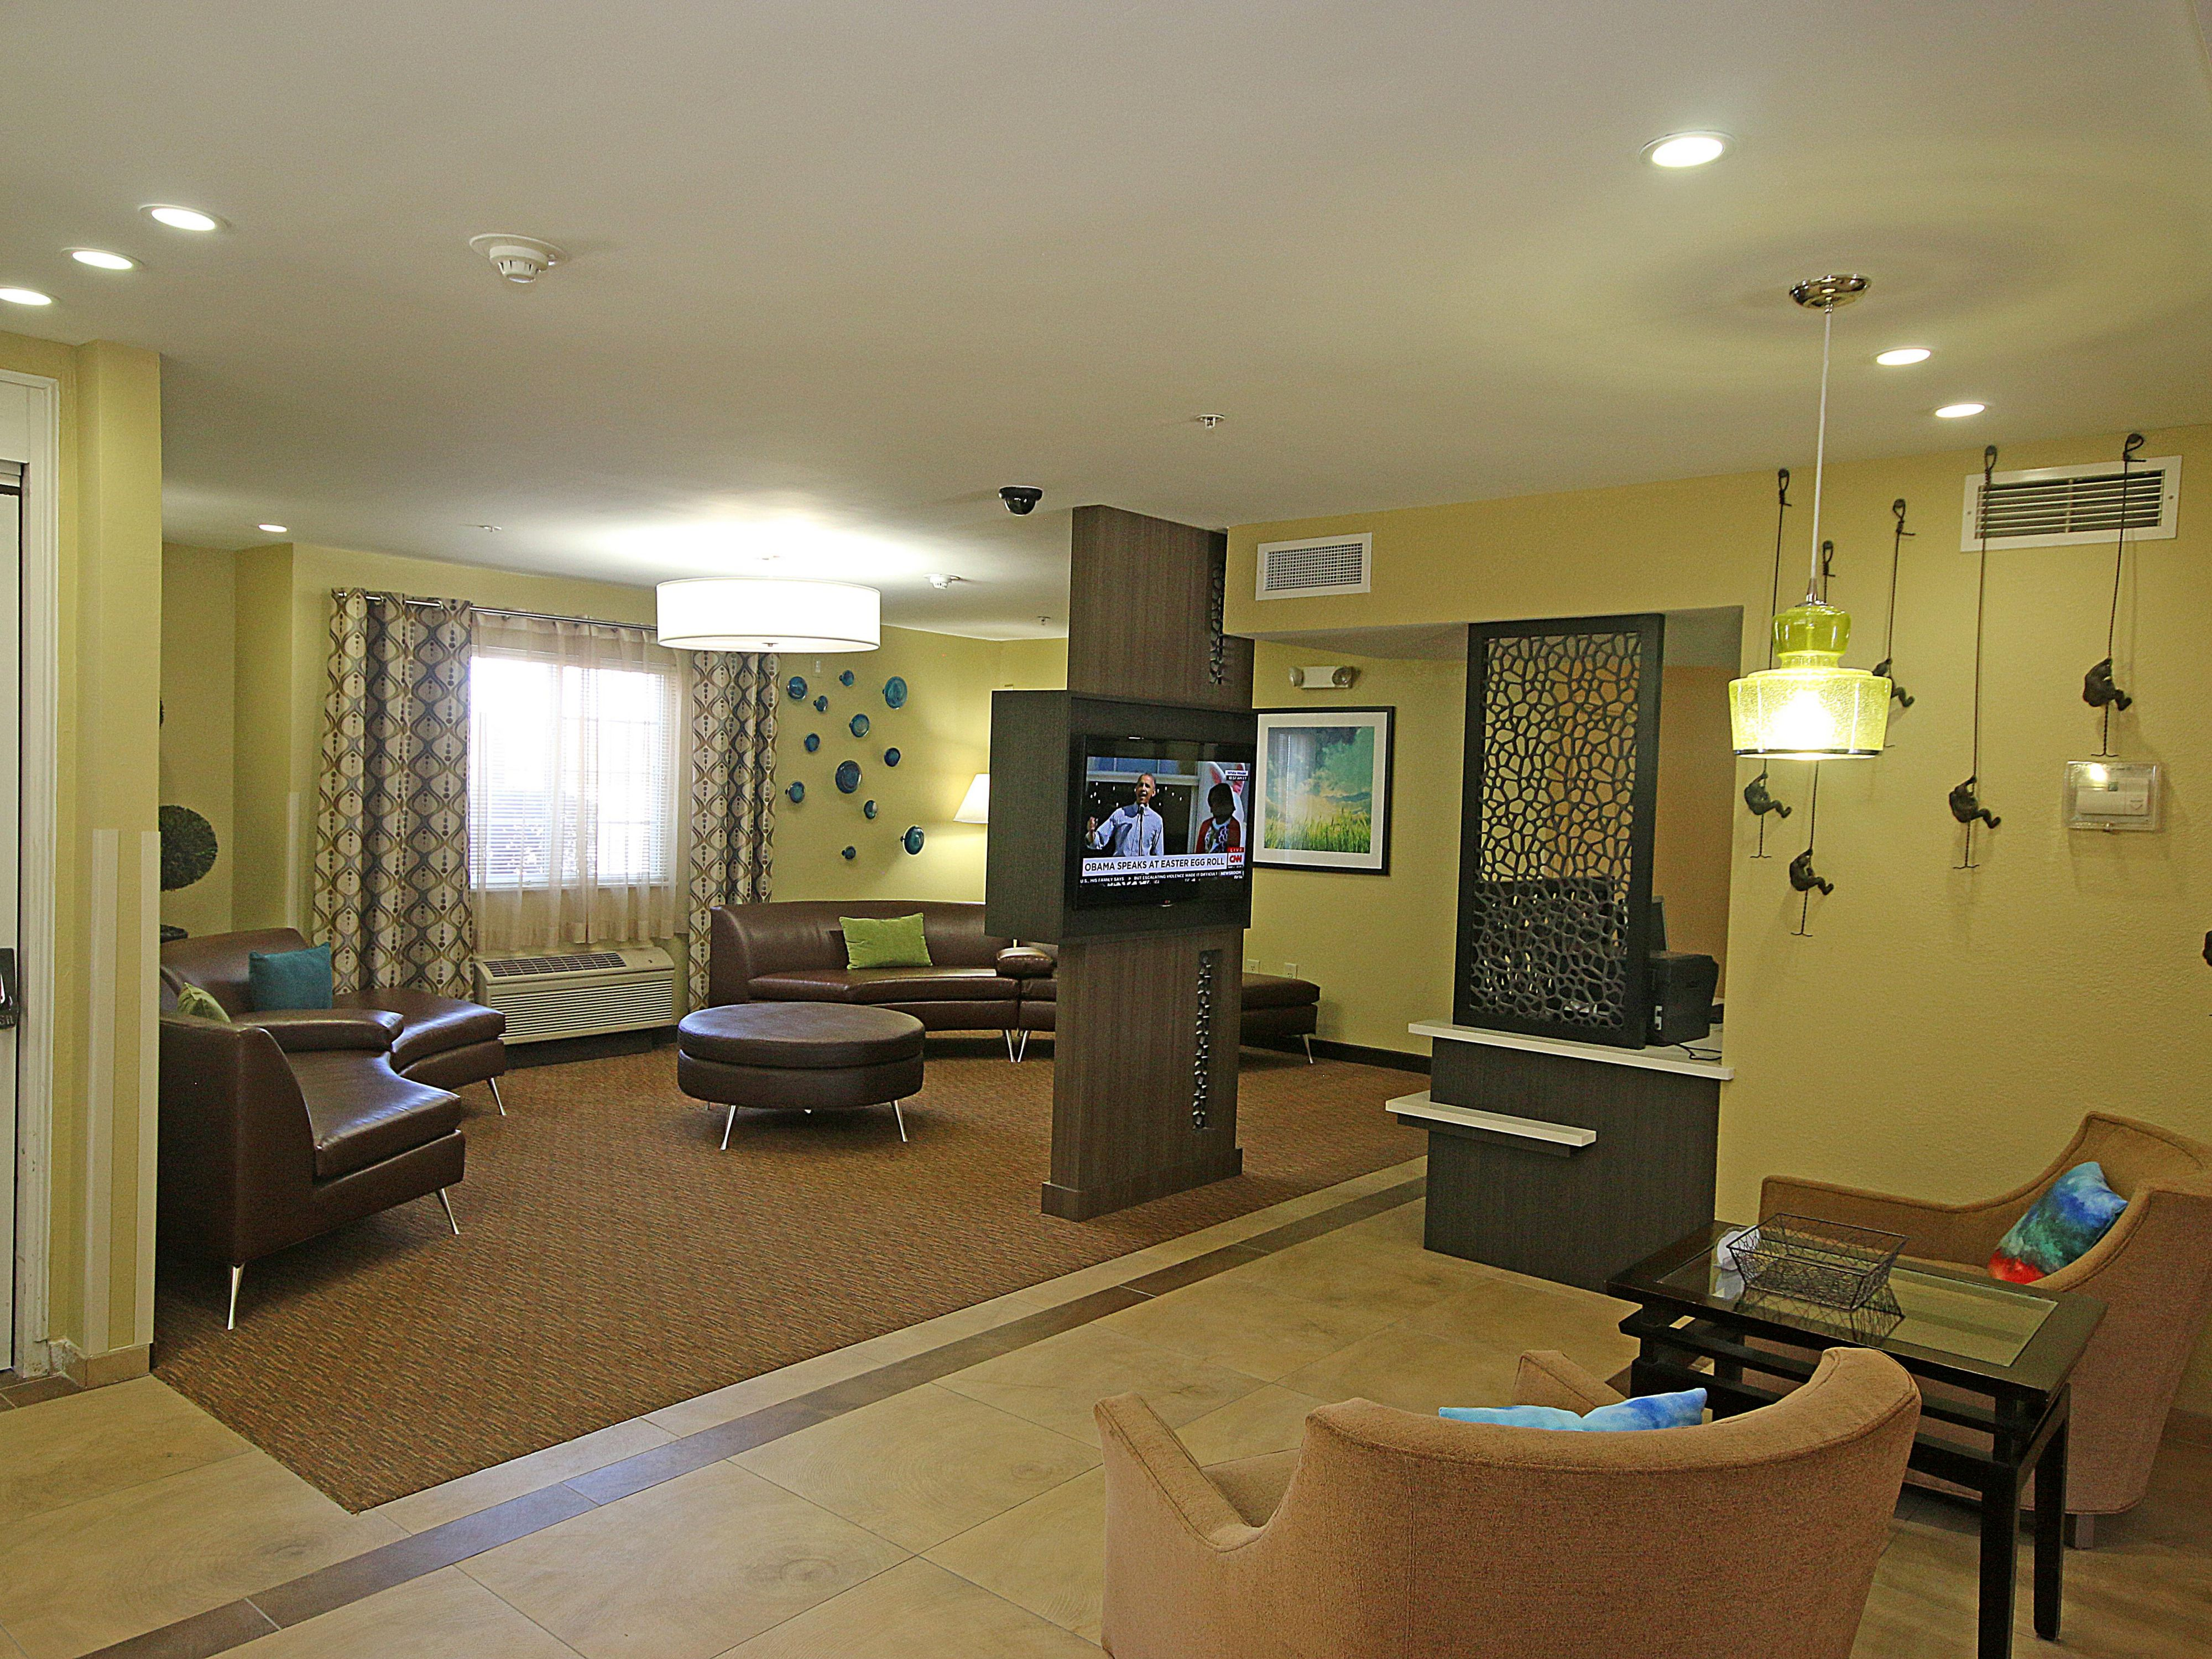 Yorktown Hotels Candlewood Suites Newport News